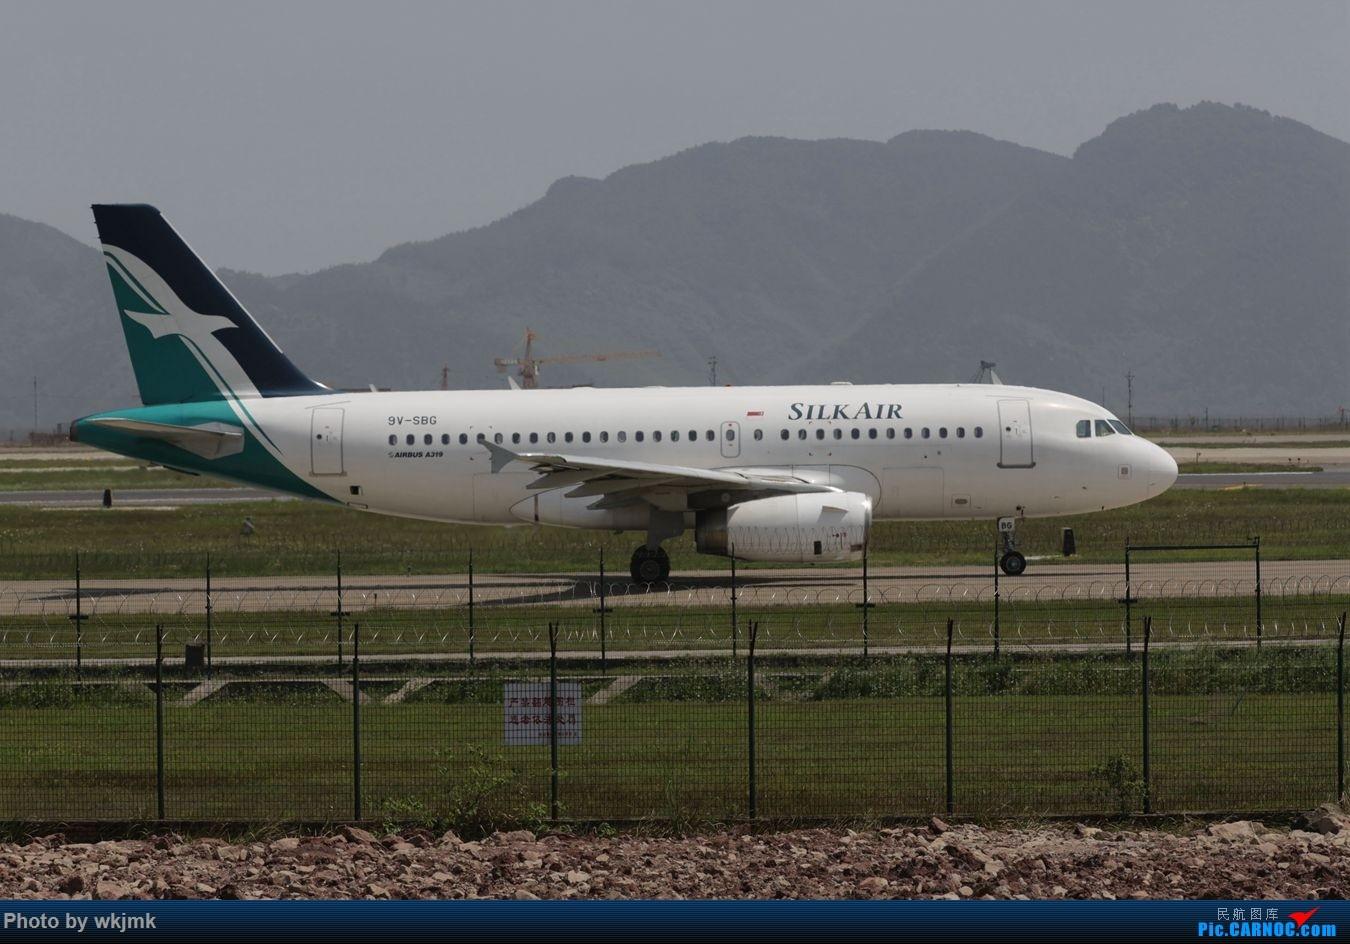 Re:[原创]CKG拍机 AIRBUS A319 9V-SBG 中国重庆江北国际机场